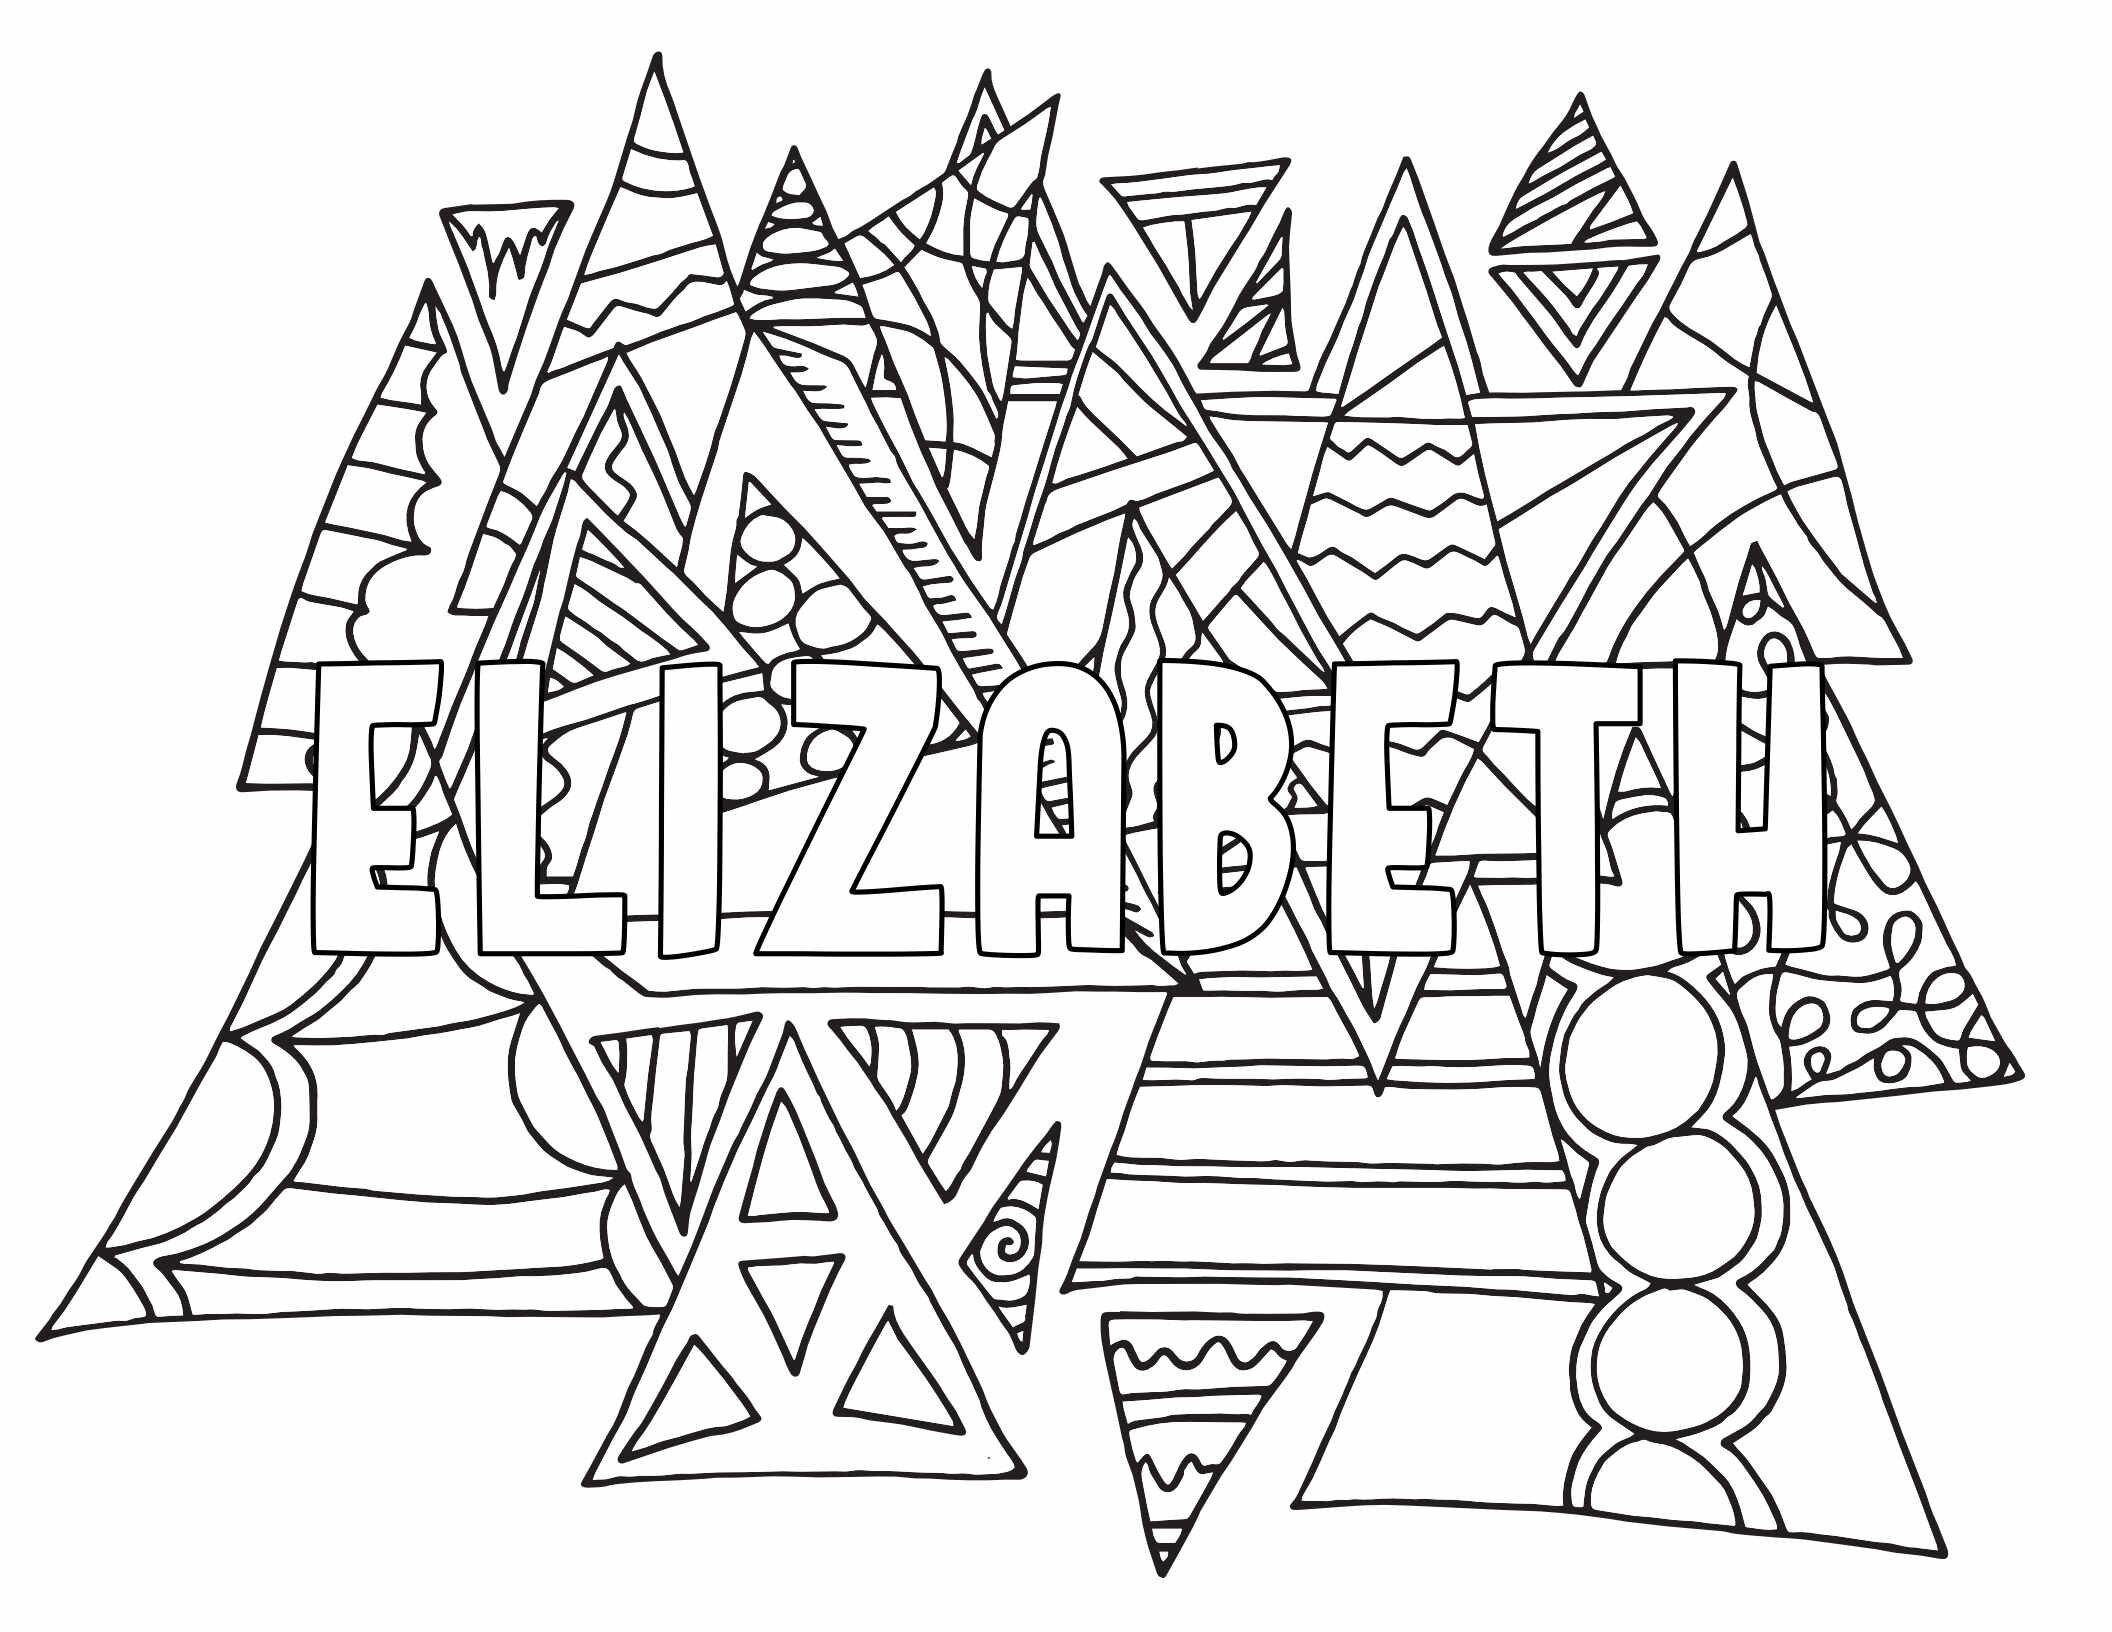 ELIZABETH Two Free Printable Coloring Page Stevie Doodles